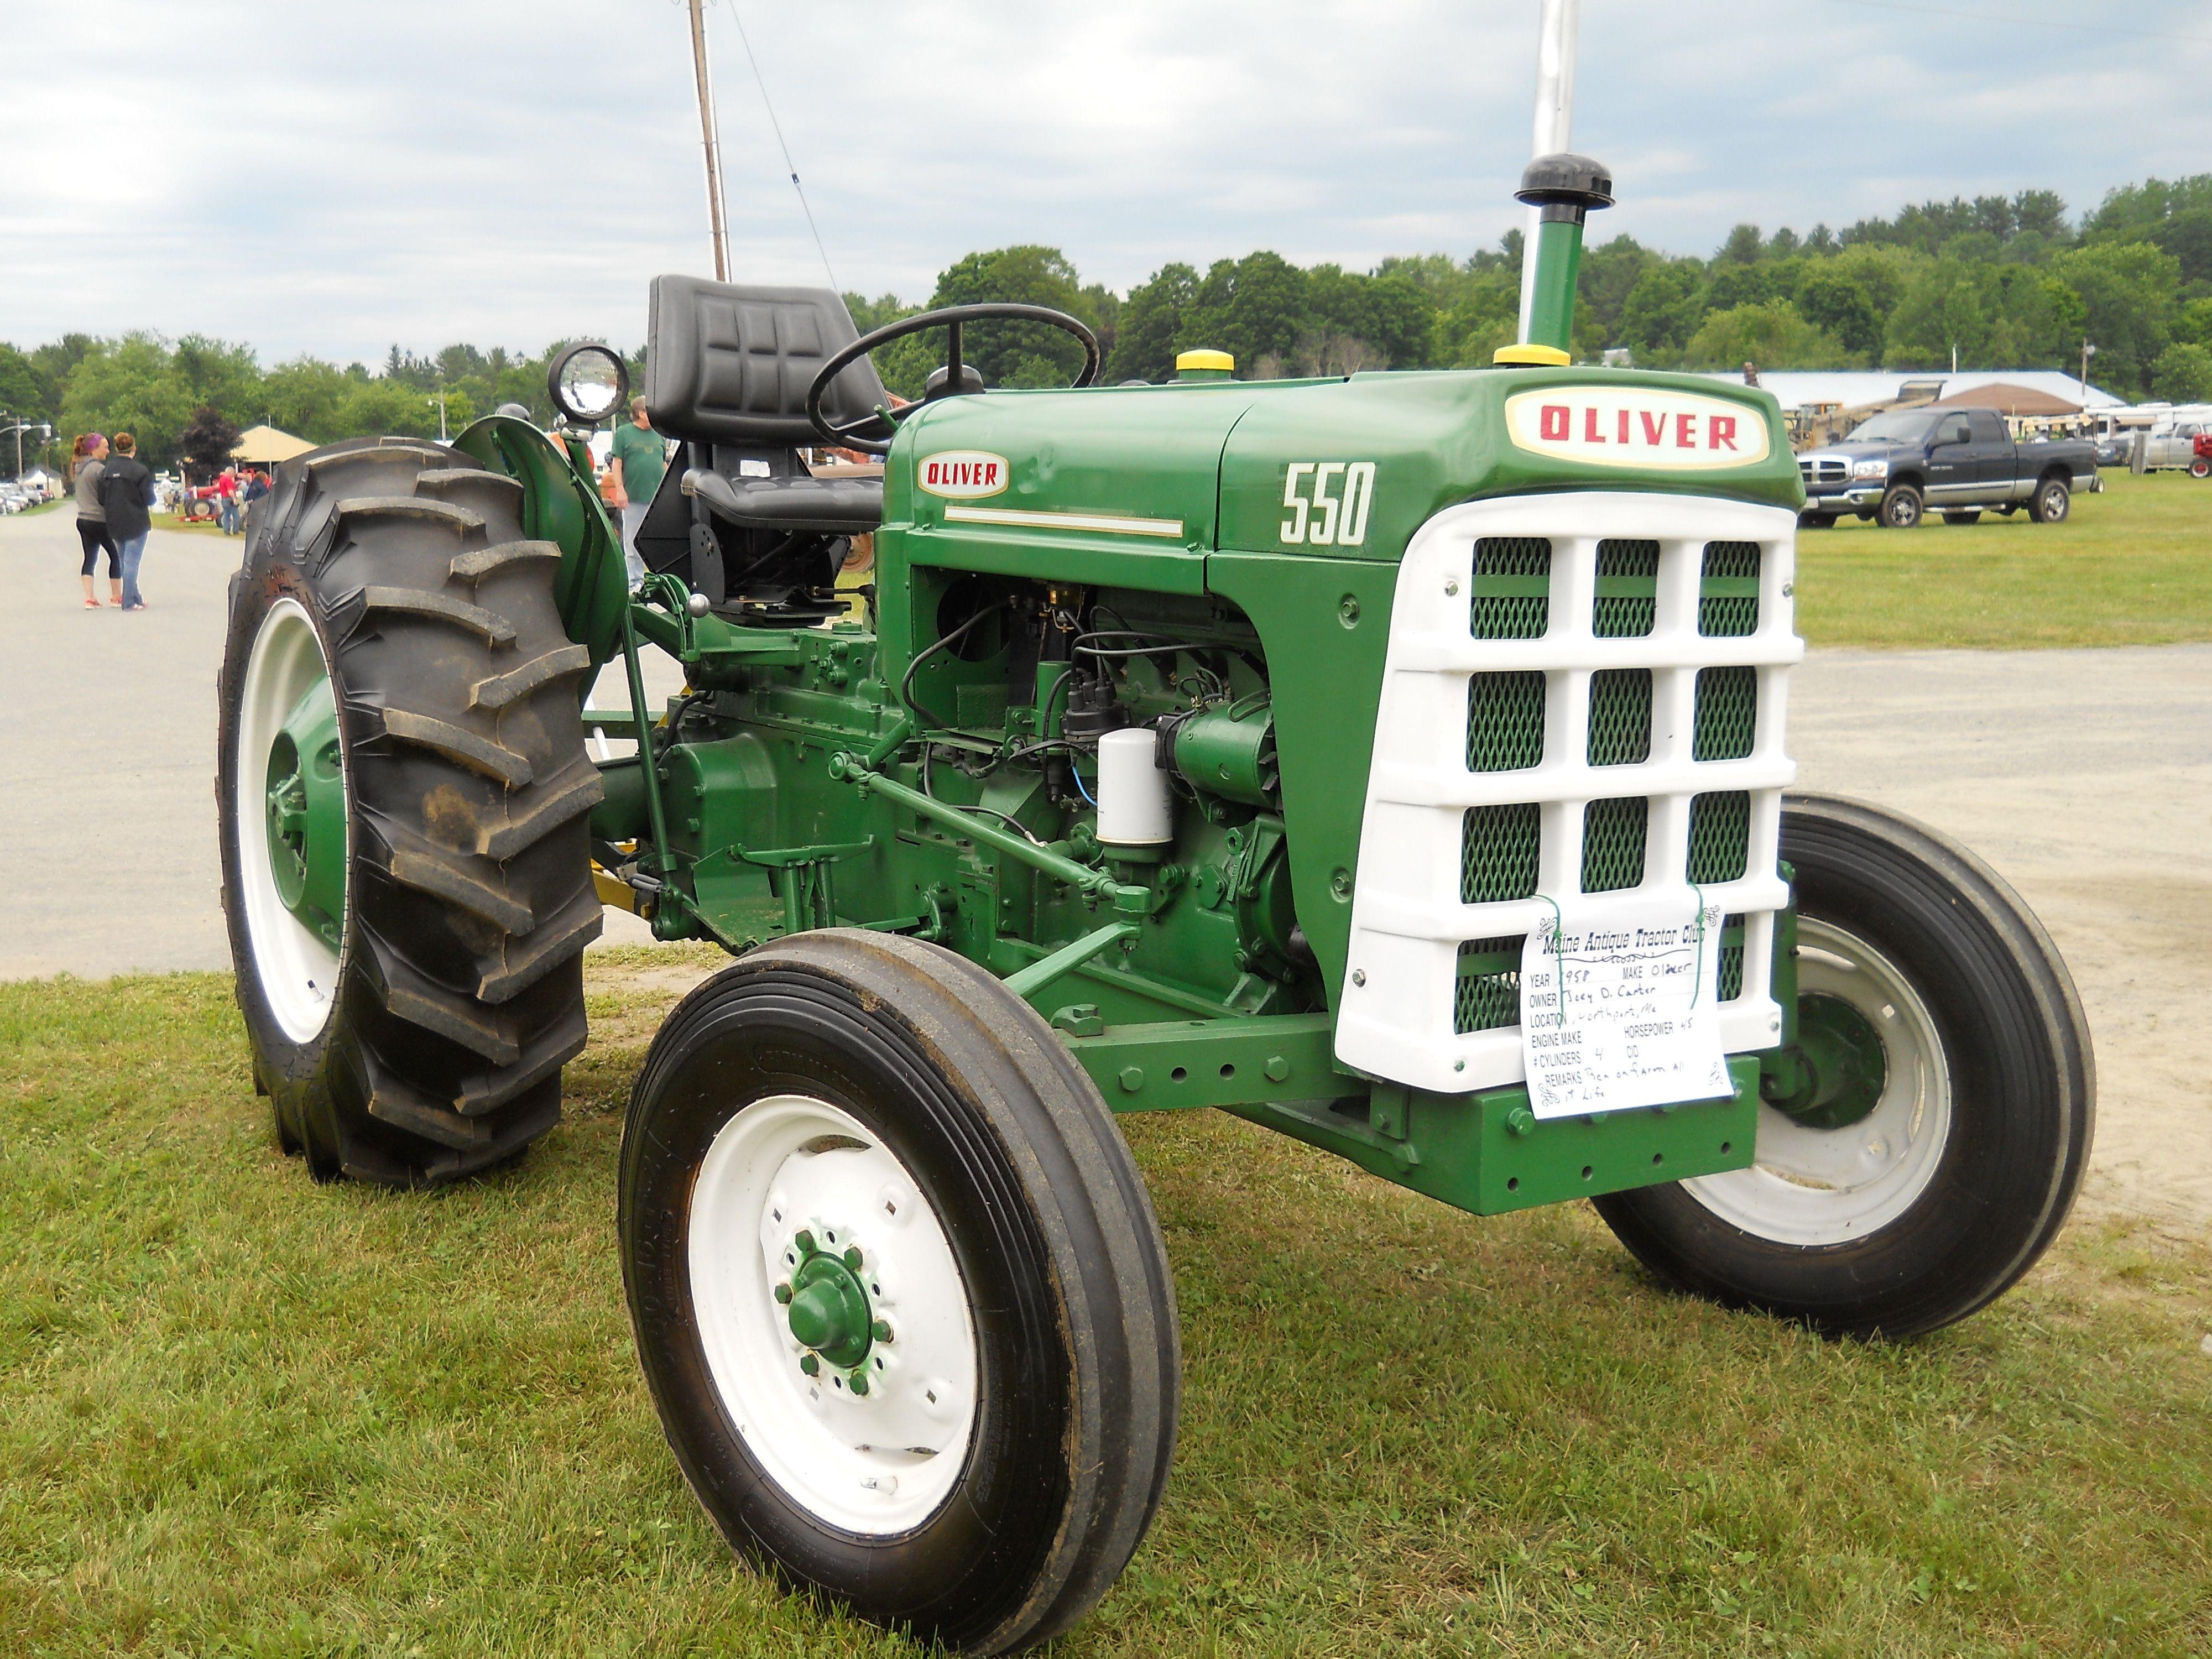 White tractor logo